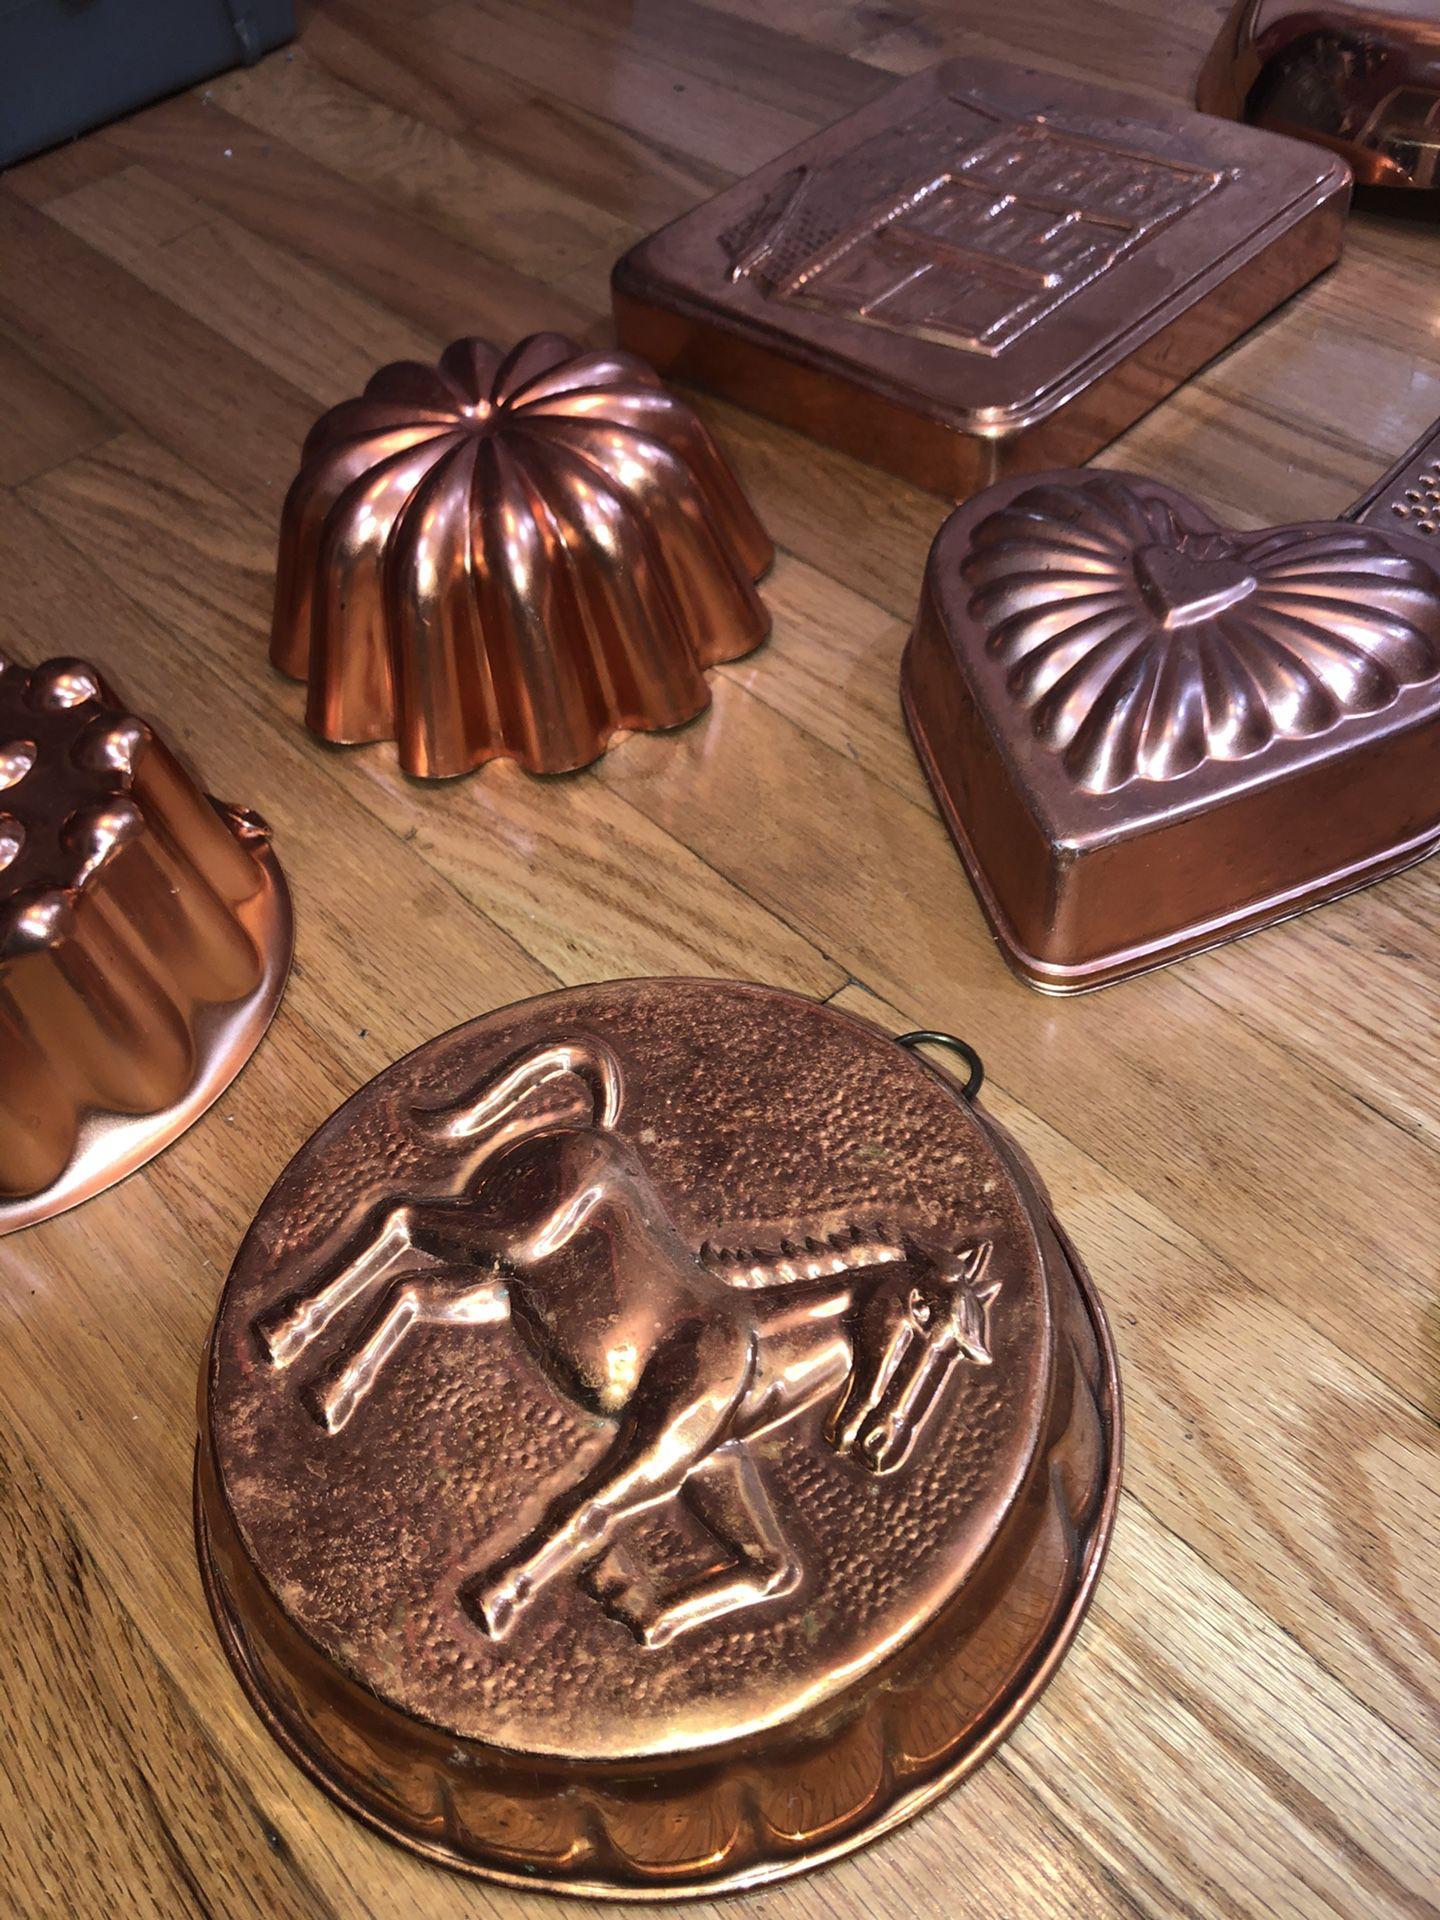 12 piece Copper Kitchenware Cooking, Baking & Decoration Set, Pot Pan Baking Bundt Cake, etc